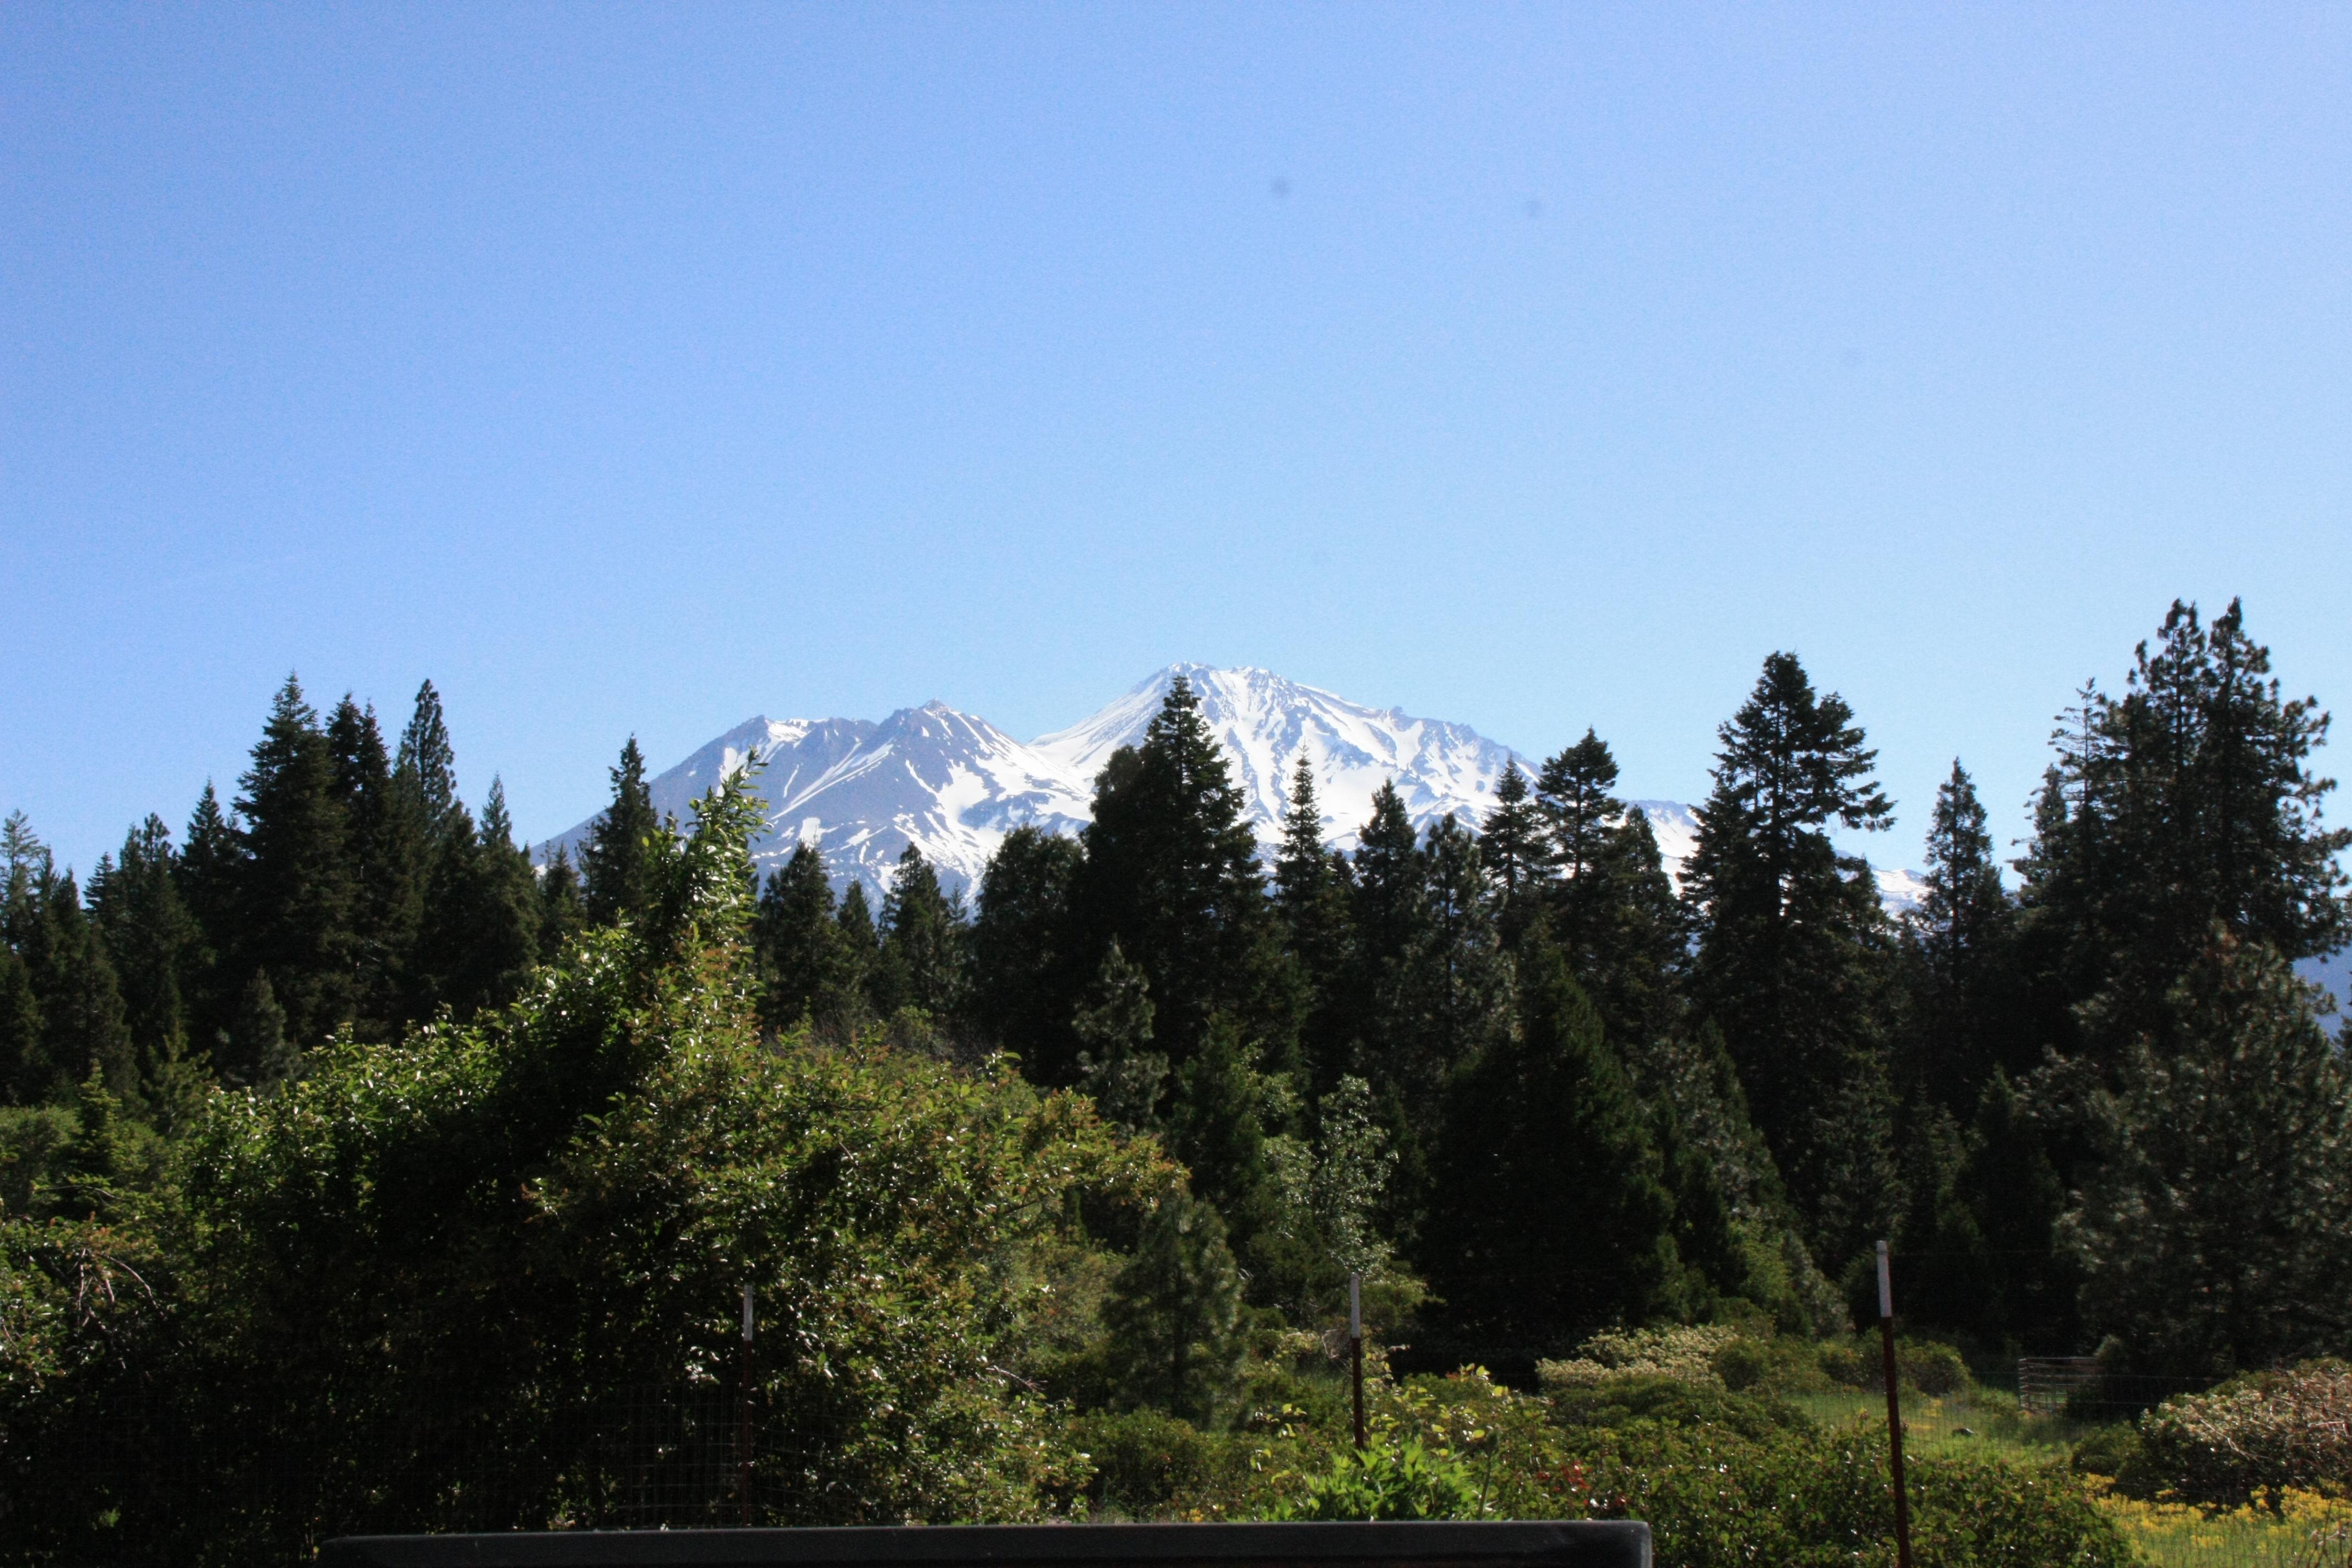 Mt Shasta Ca >> Mission Of Hope Tour Next Stop Mt Shasta Ca Faith Walk